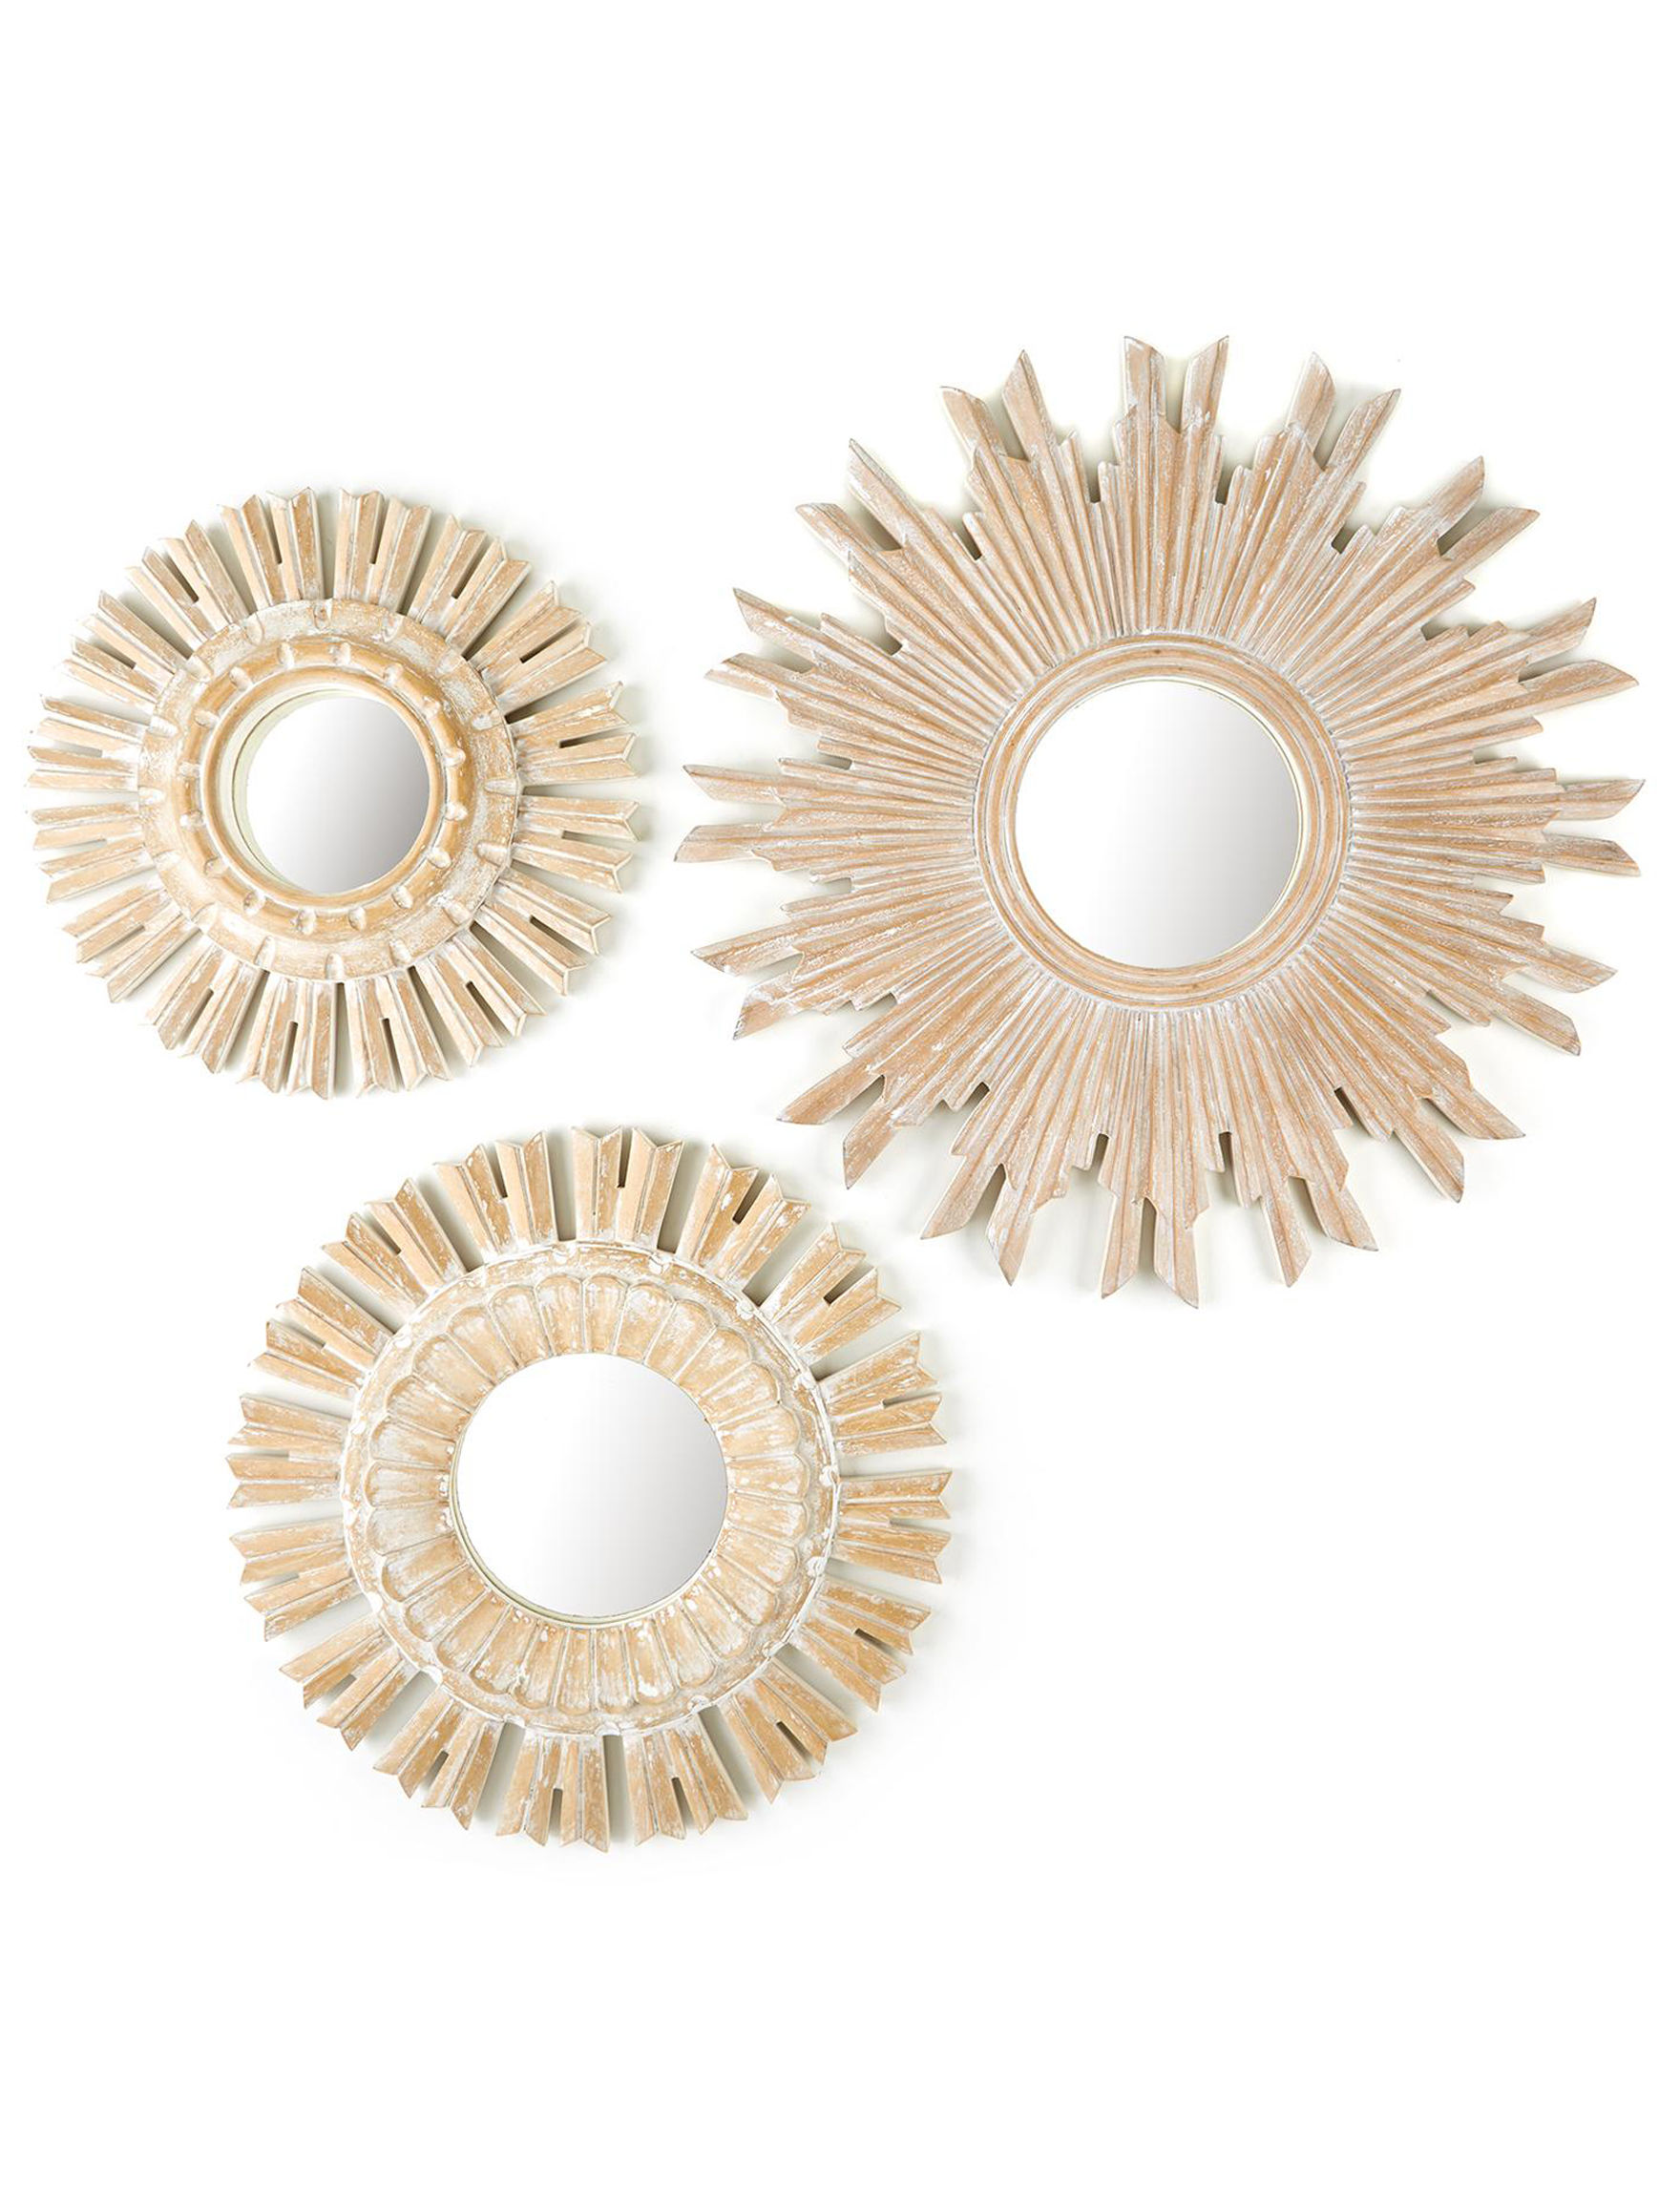 Two's Company White Mirrors Wall Decor